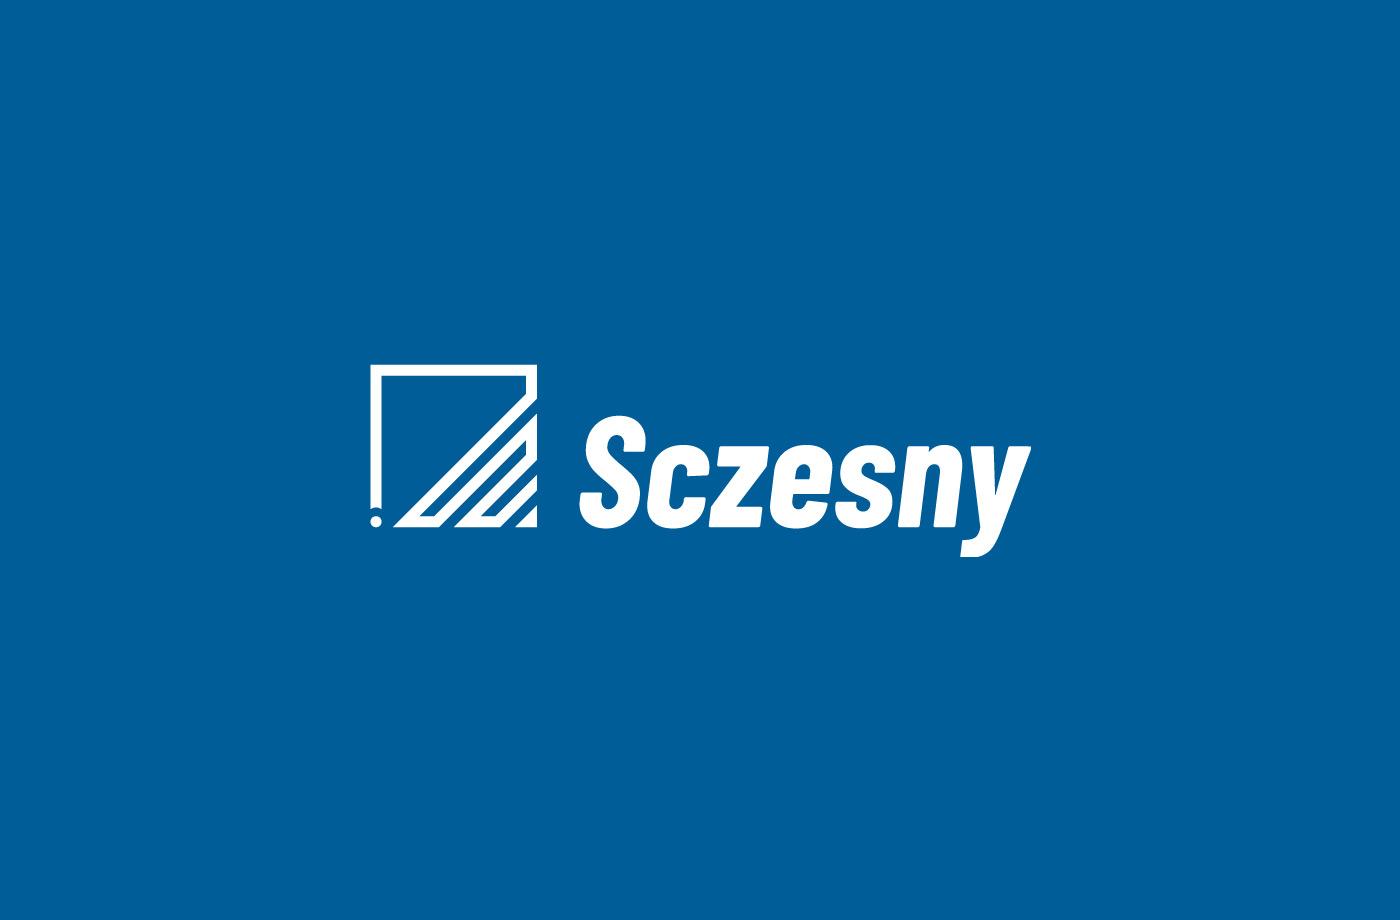 ci-sczesny-logovarianten-2